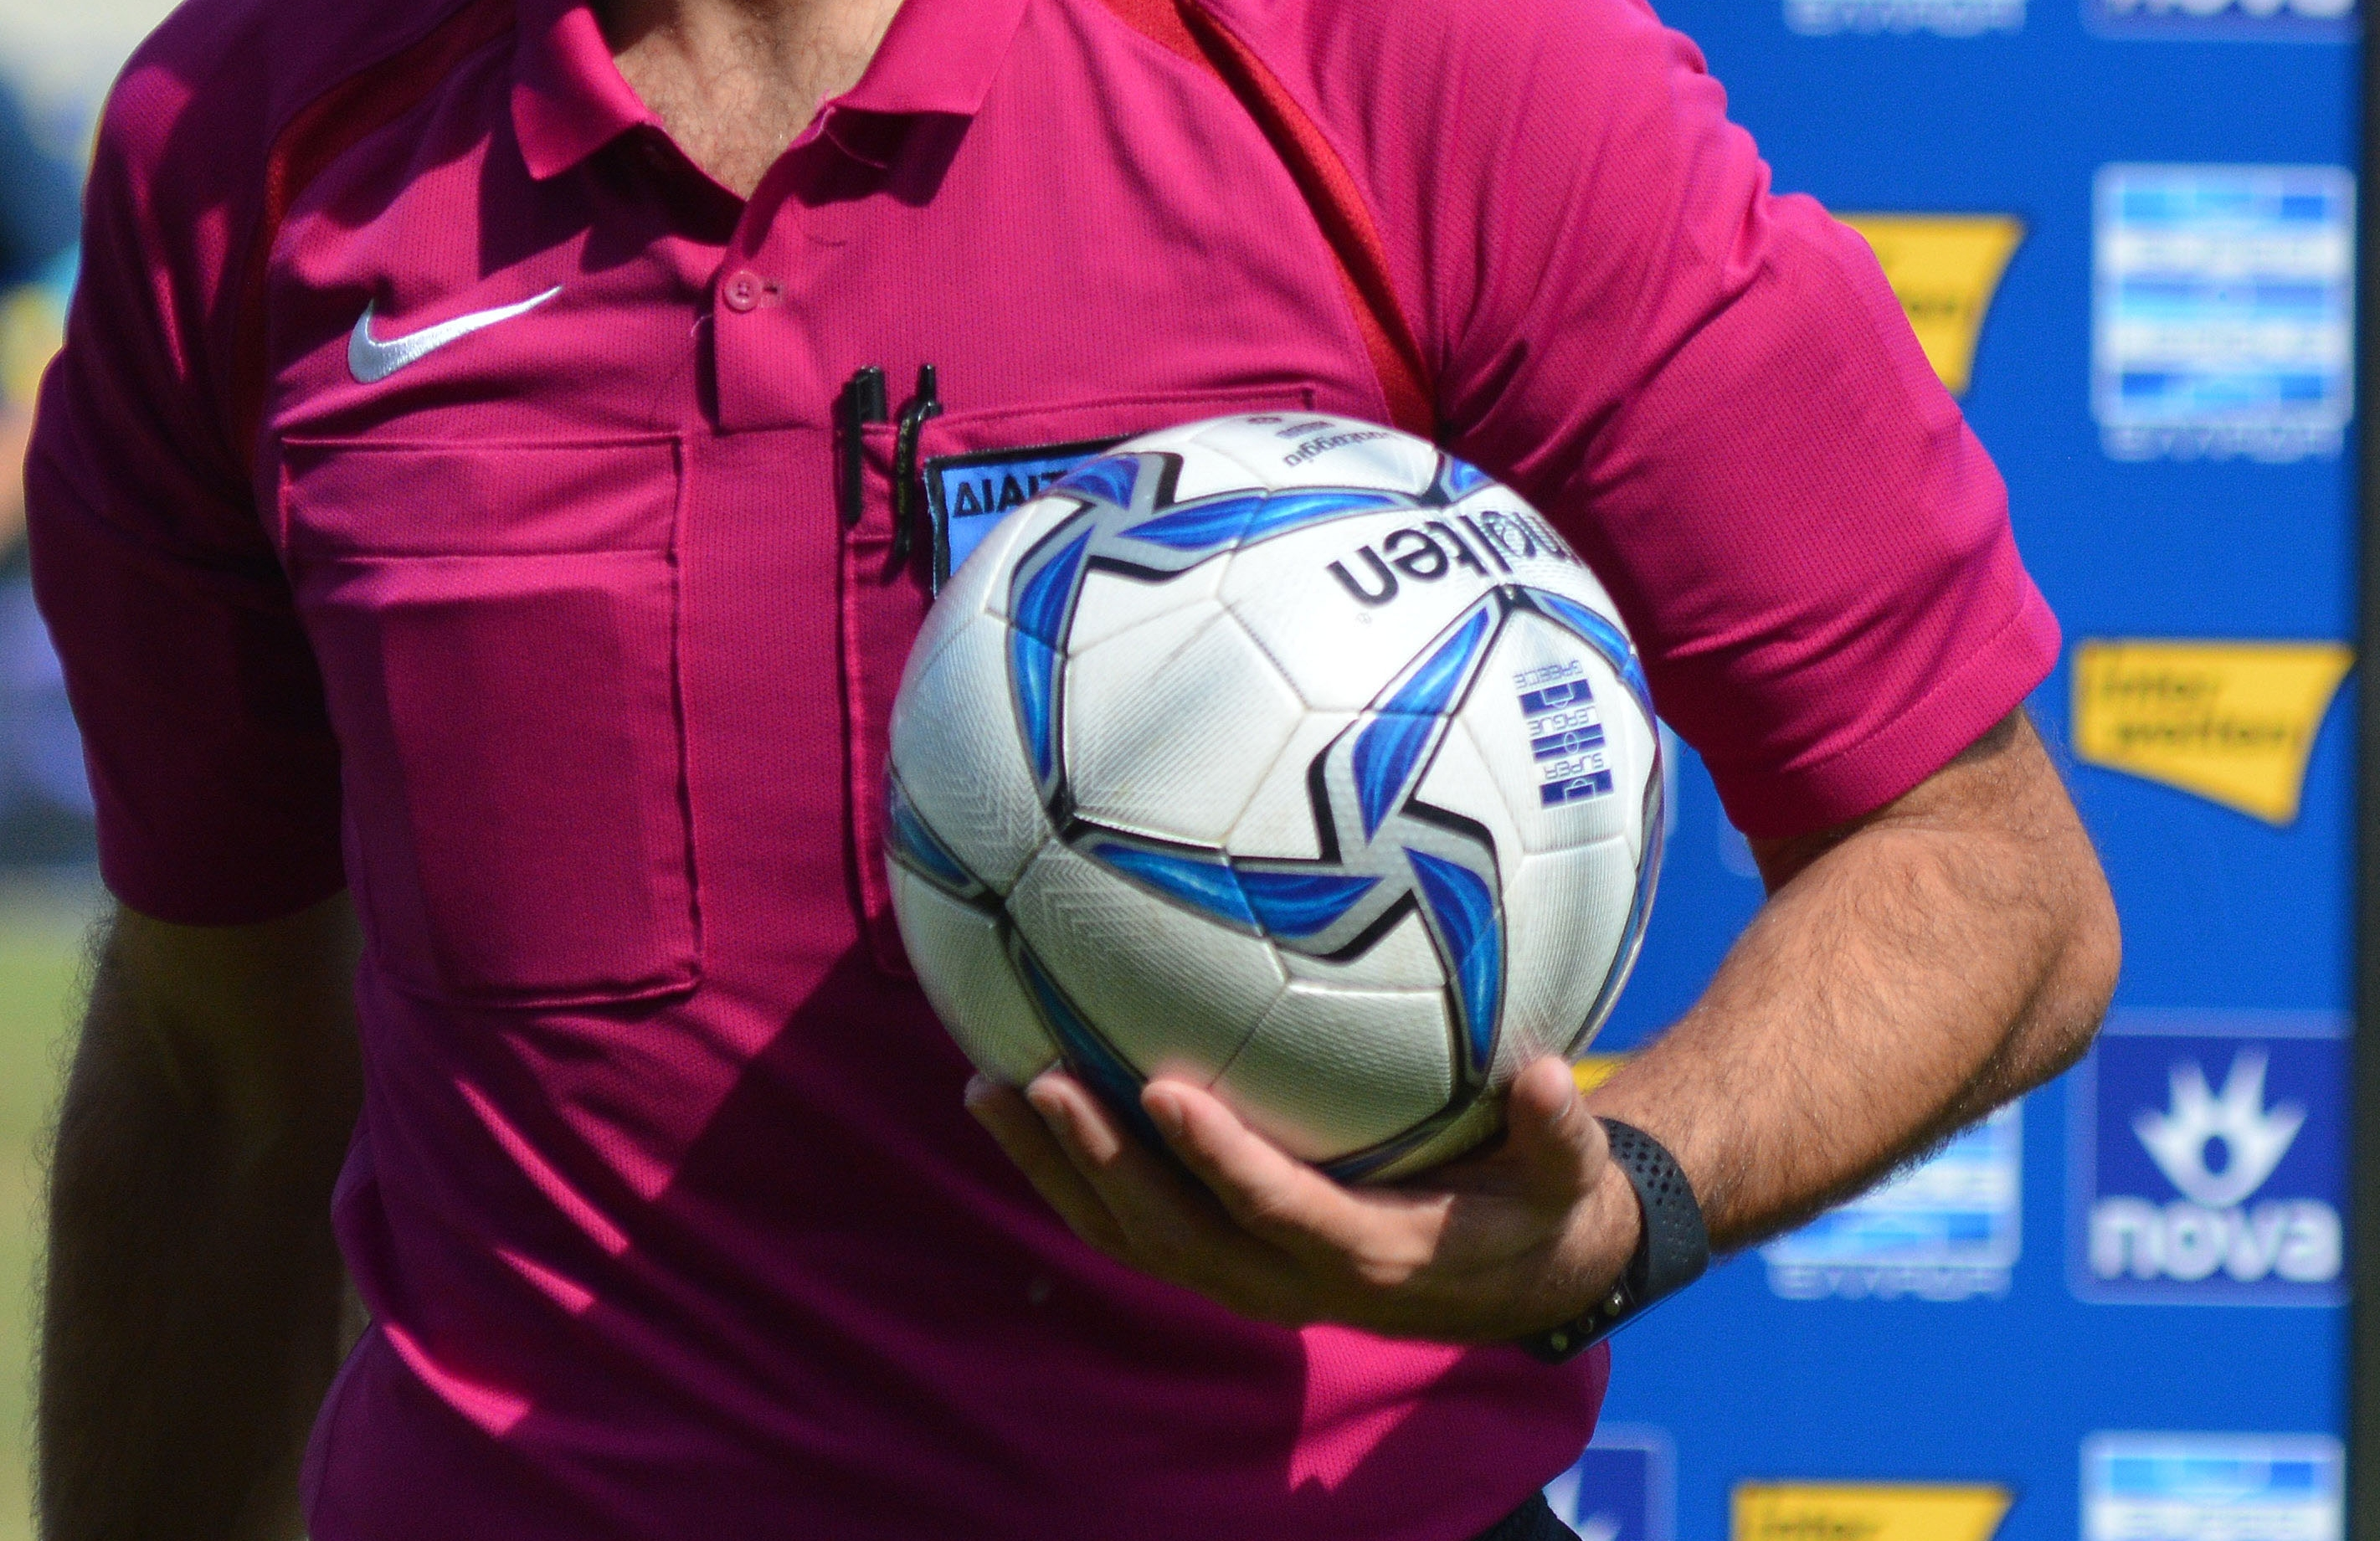 Superleague: Ξαφνική αλλαγή βοηθού διαιτητή στο παιχνίδι του ΠΑΟΚ λόγω κορονοϊού